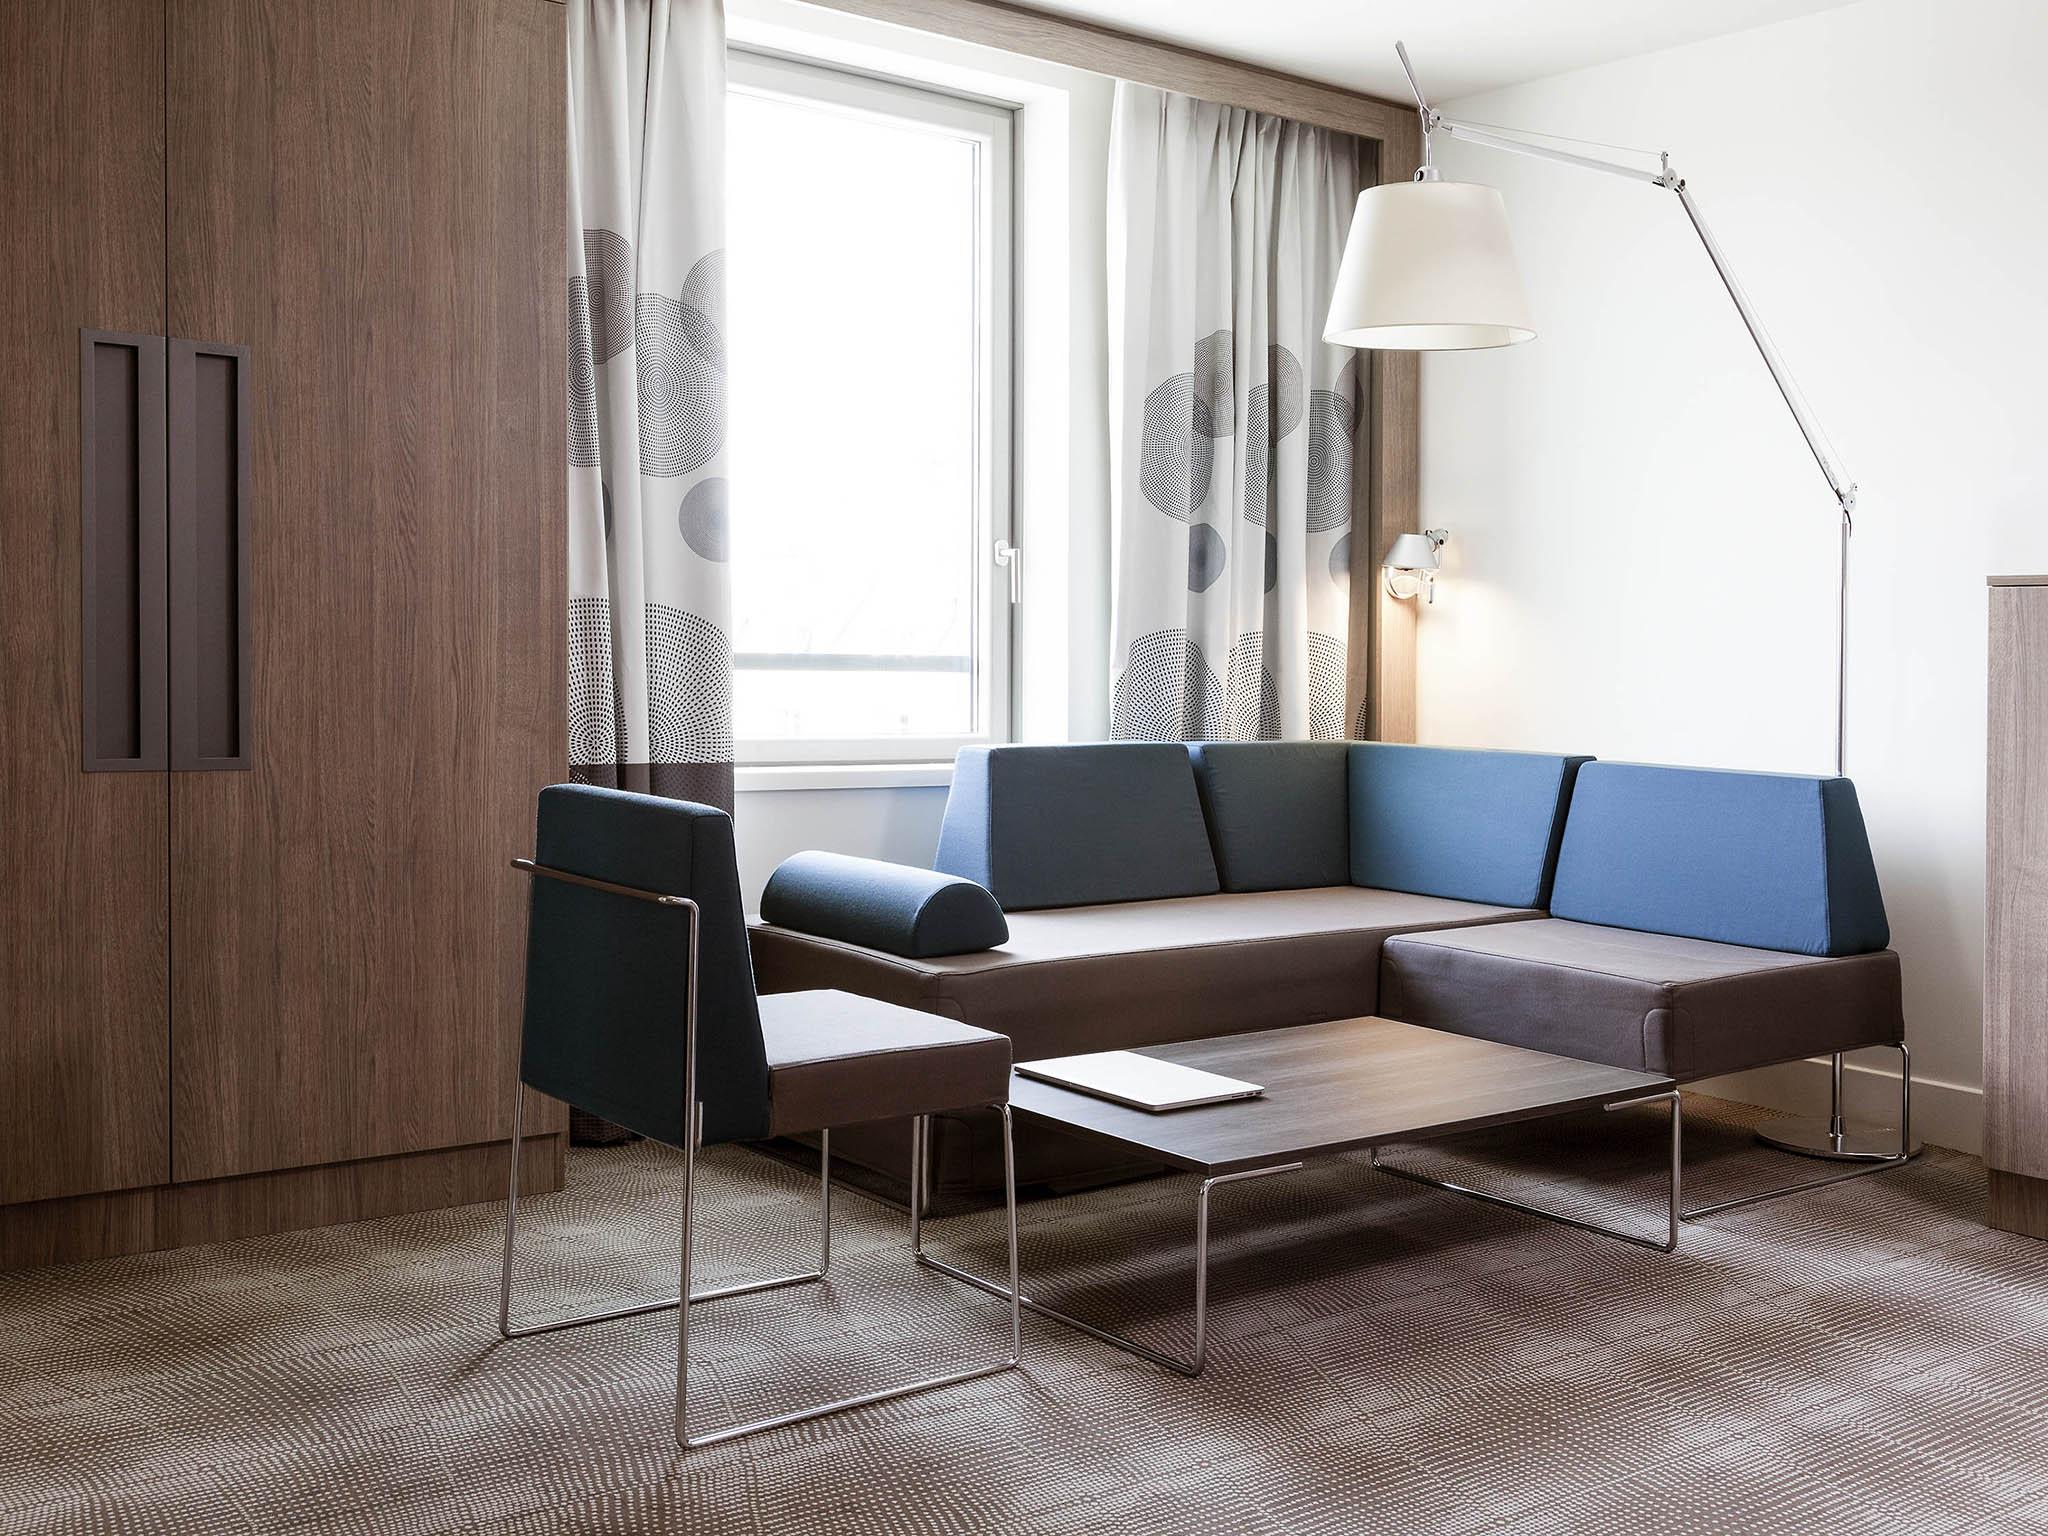 Hotel In Saint Denis Novotel Paris Stade Basilique Ibis Tek Light Bar Wiring Harness Rooms